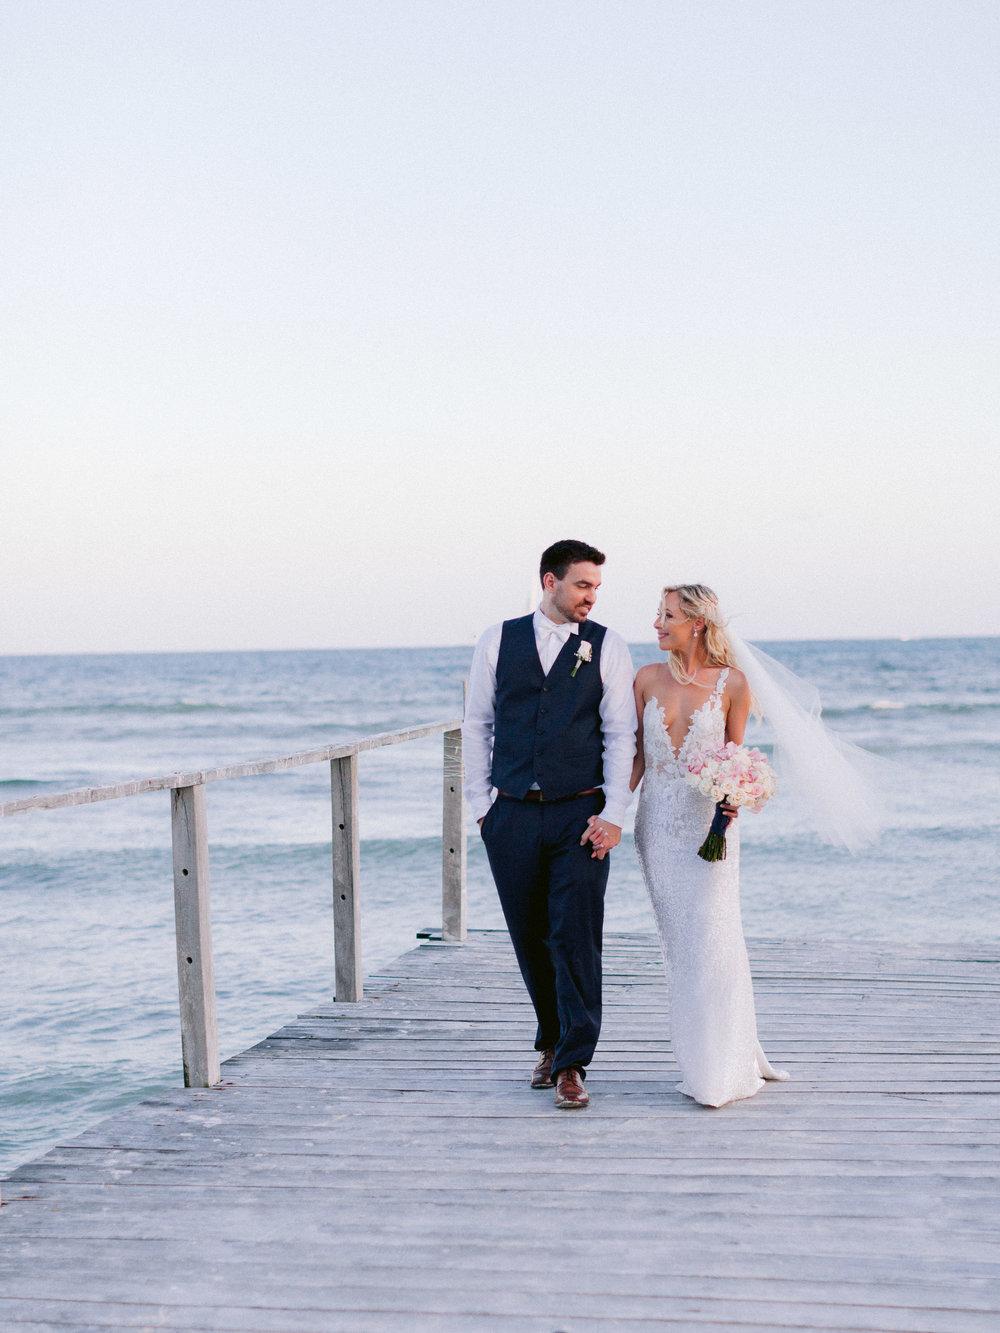 Kim_Jeff_Cancun Wedding_Portraits_Kurtz_Orpia (139 of 178).jpg